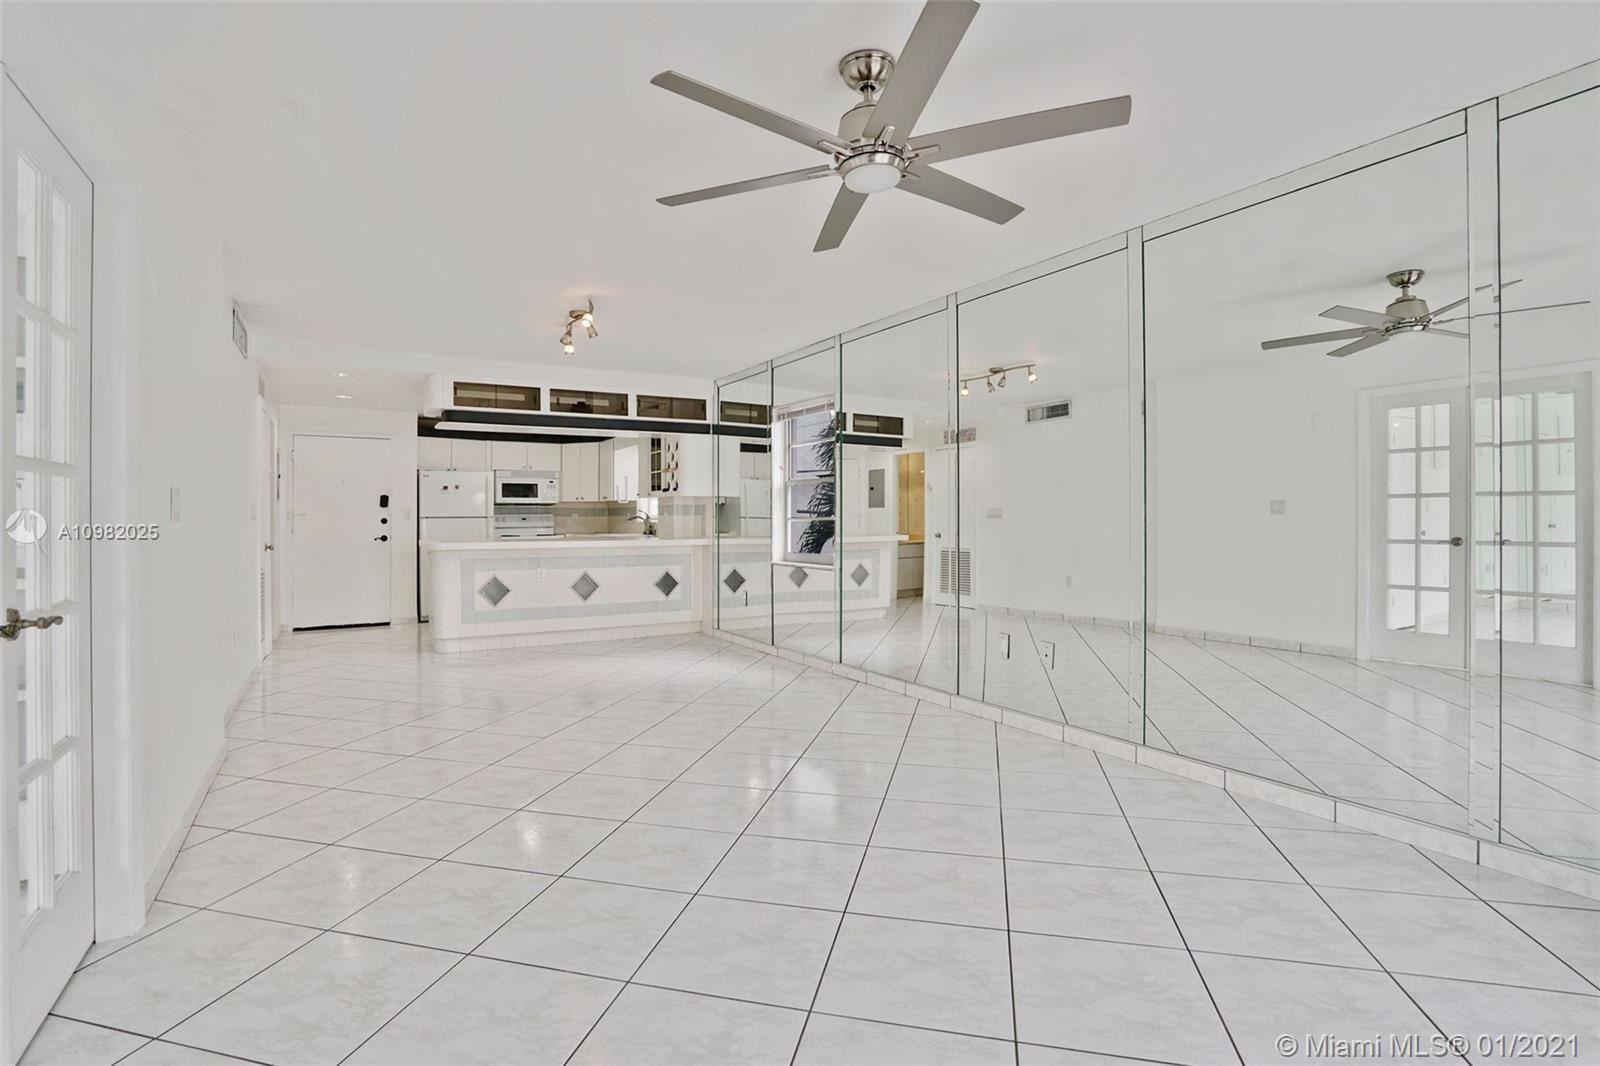 1000 Michigan Ave #203, Miami Beach, FL 33139 - #: A10982025